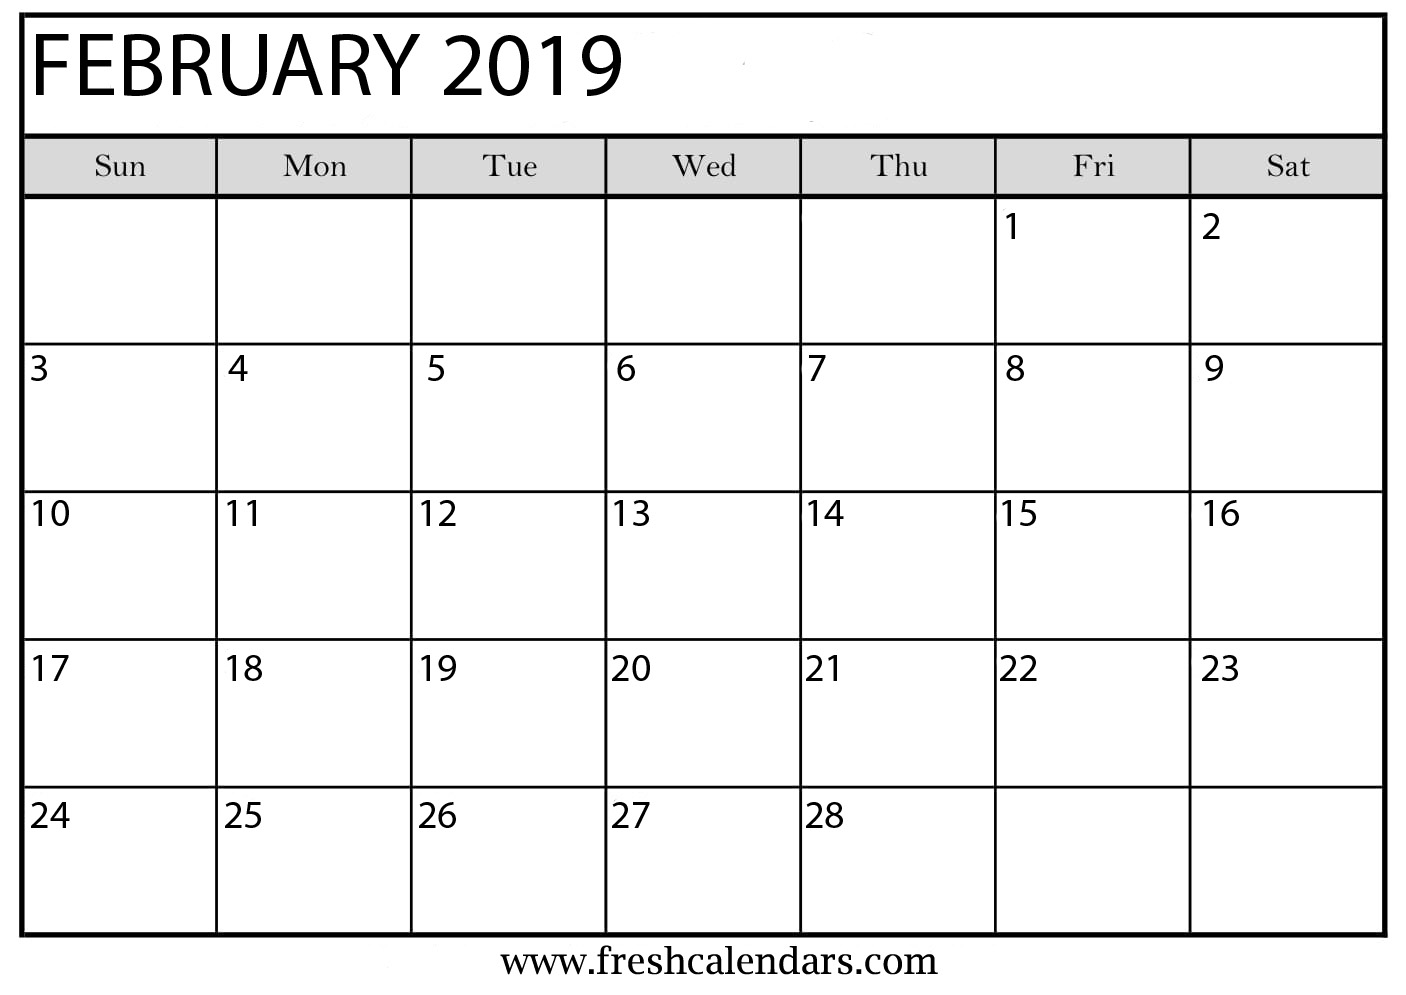 Monthly Calendar February 2019